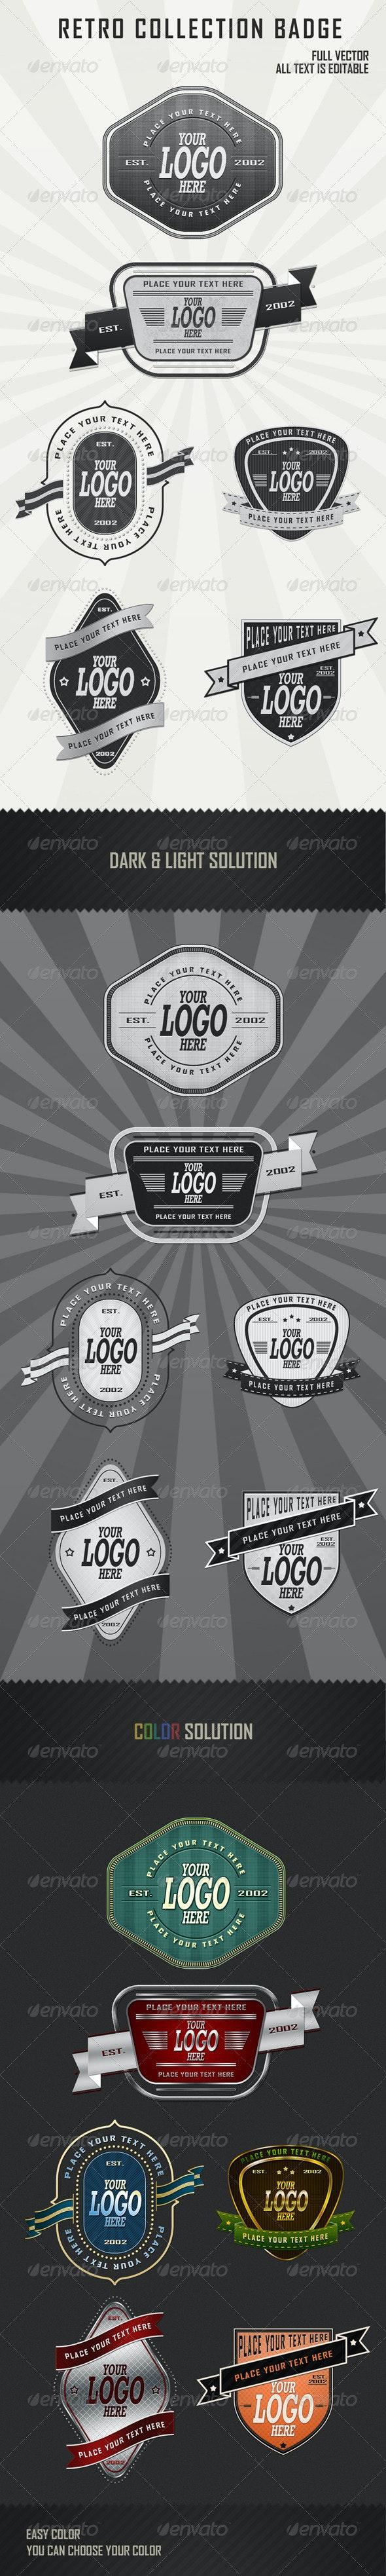 Retro Badges Collection vol2 - Badges & Stickers Web Elements